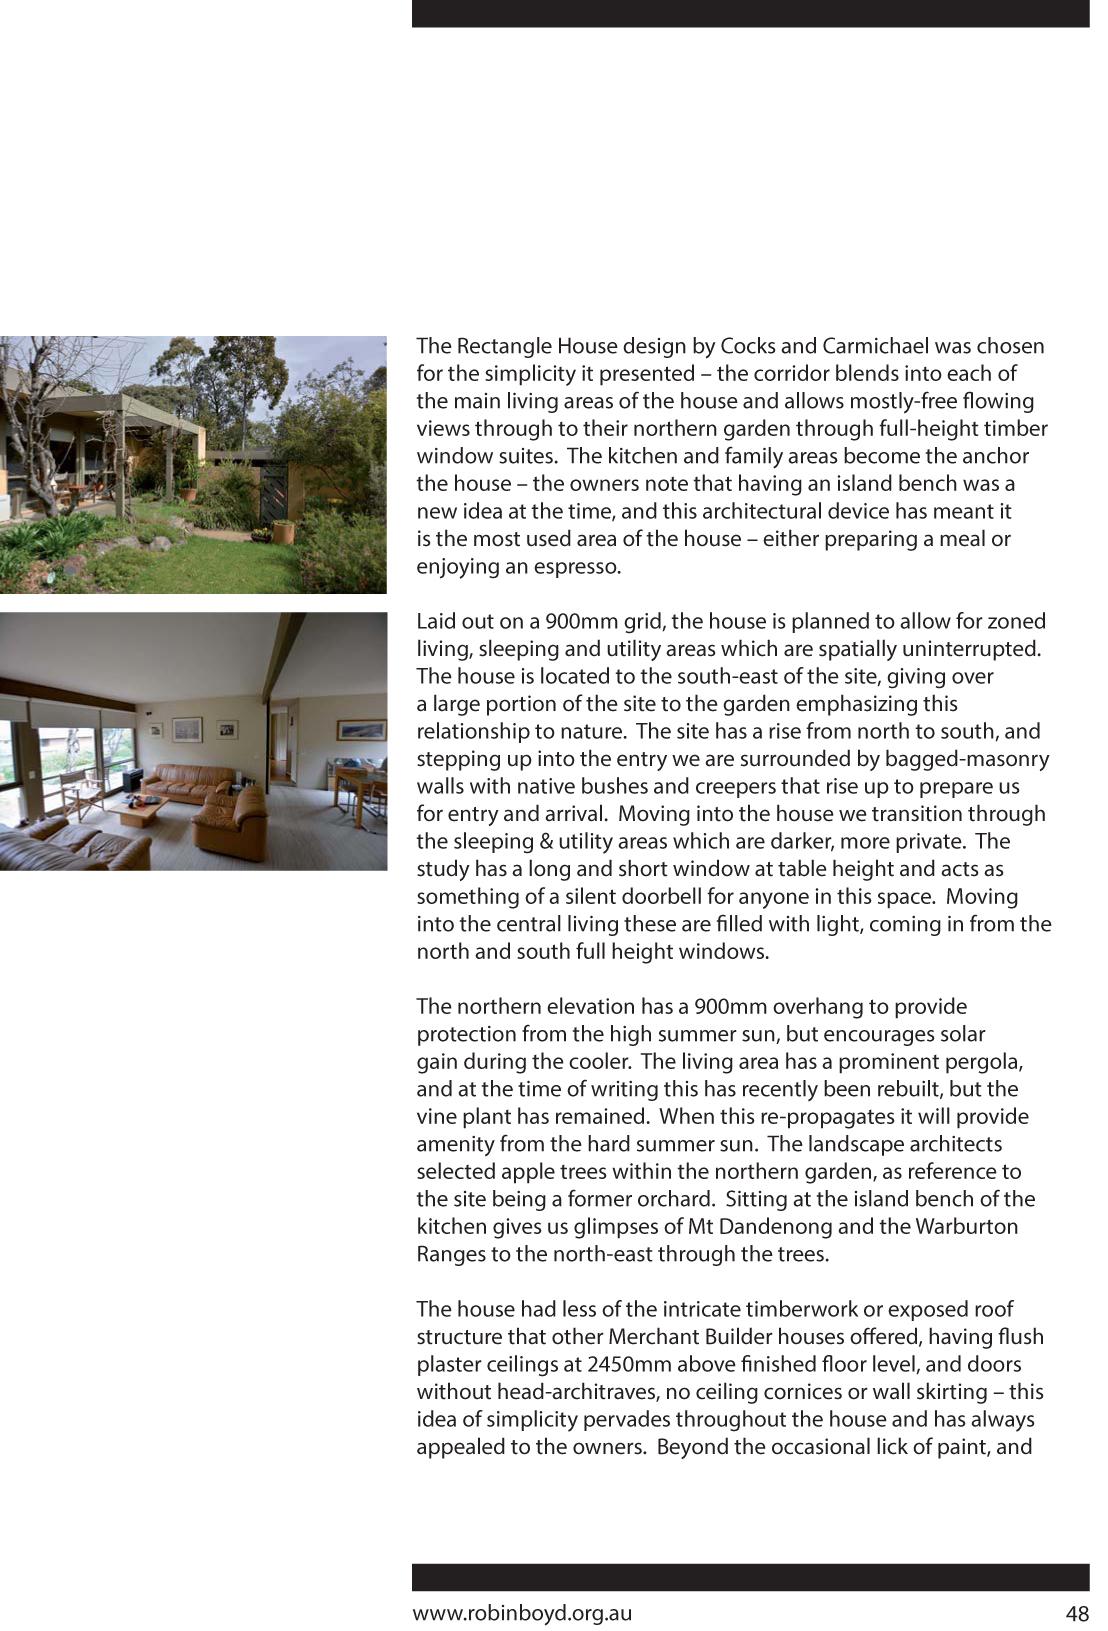 Merchant Builders Rectangle House Review 24SEP17-3.jpg